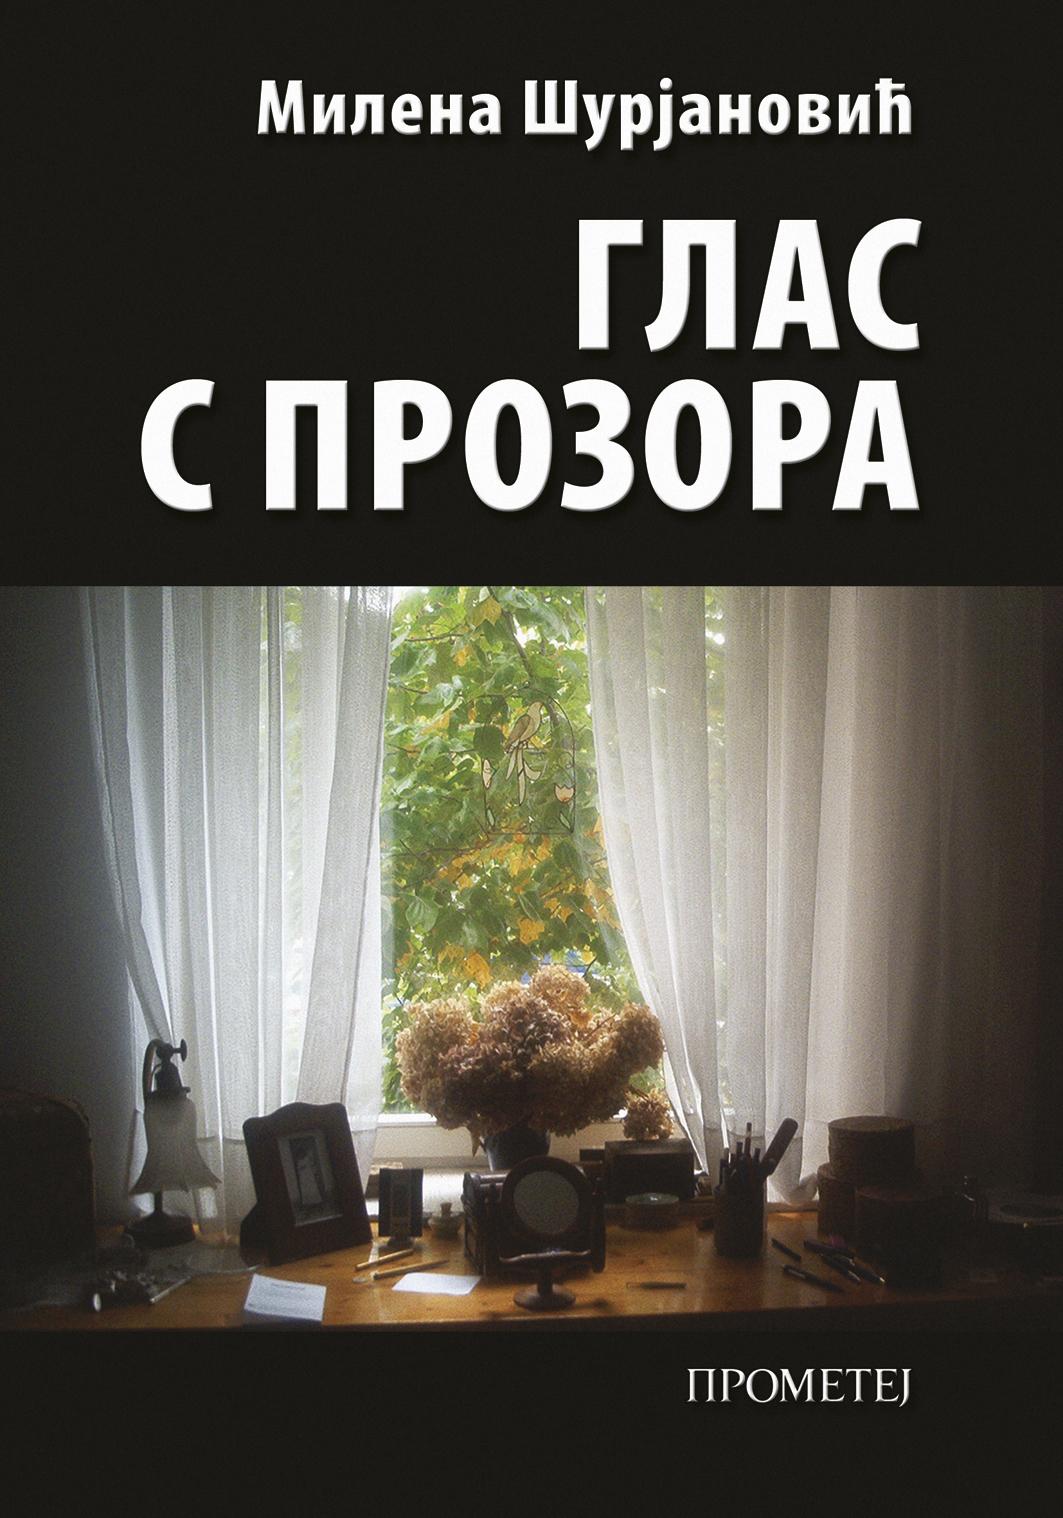 Глас с прозора